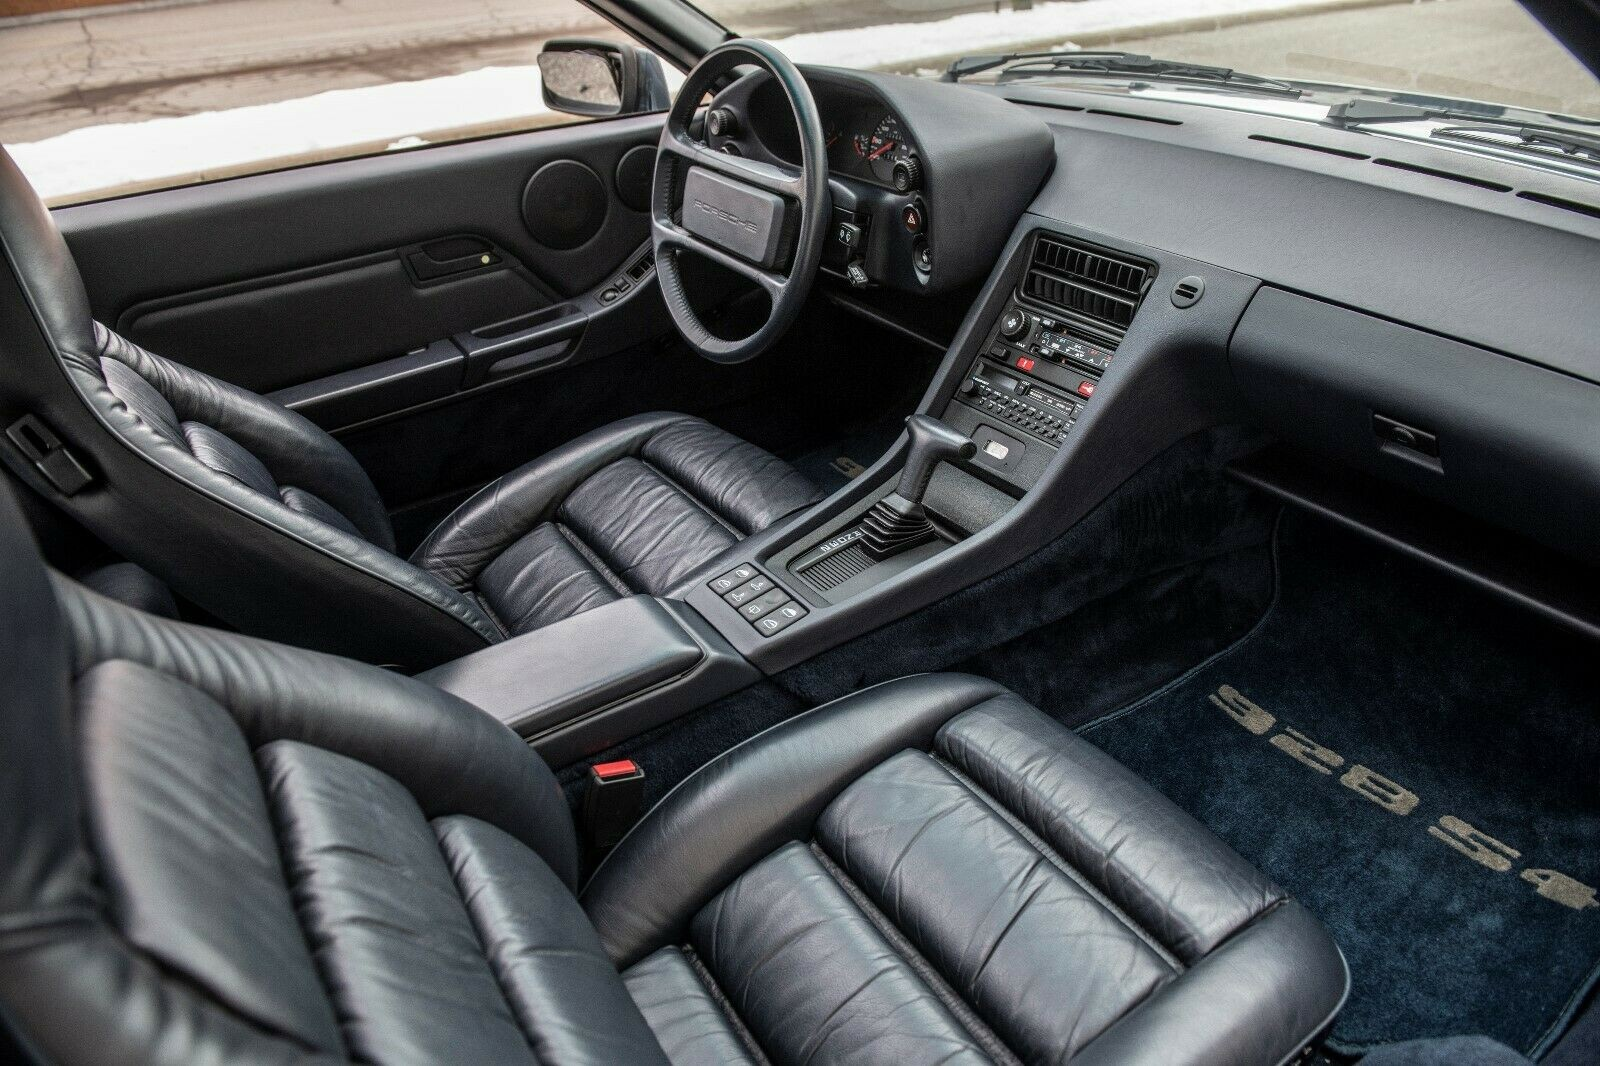 Porsche 928 S4 de vanzare - Porsche 928 S4 de vanzare